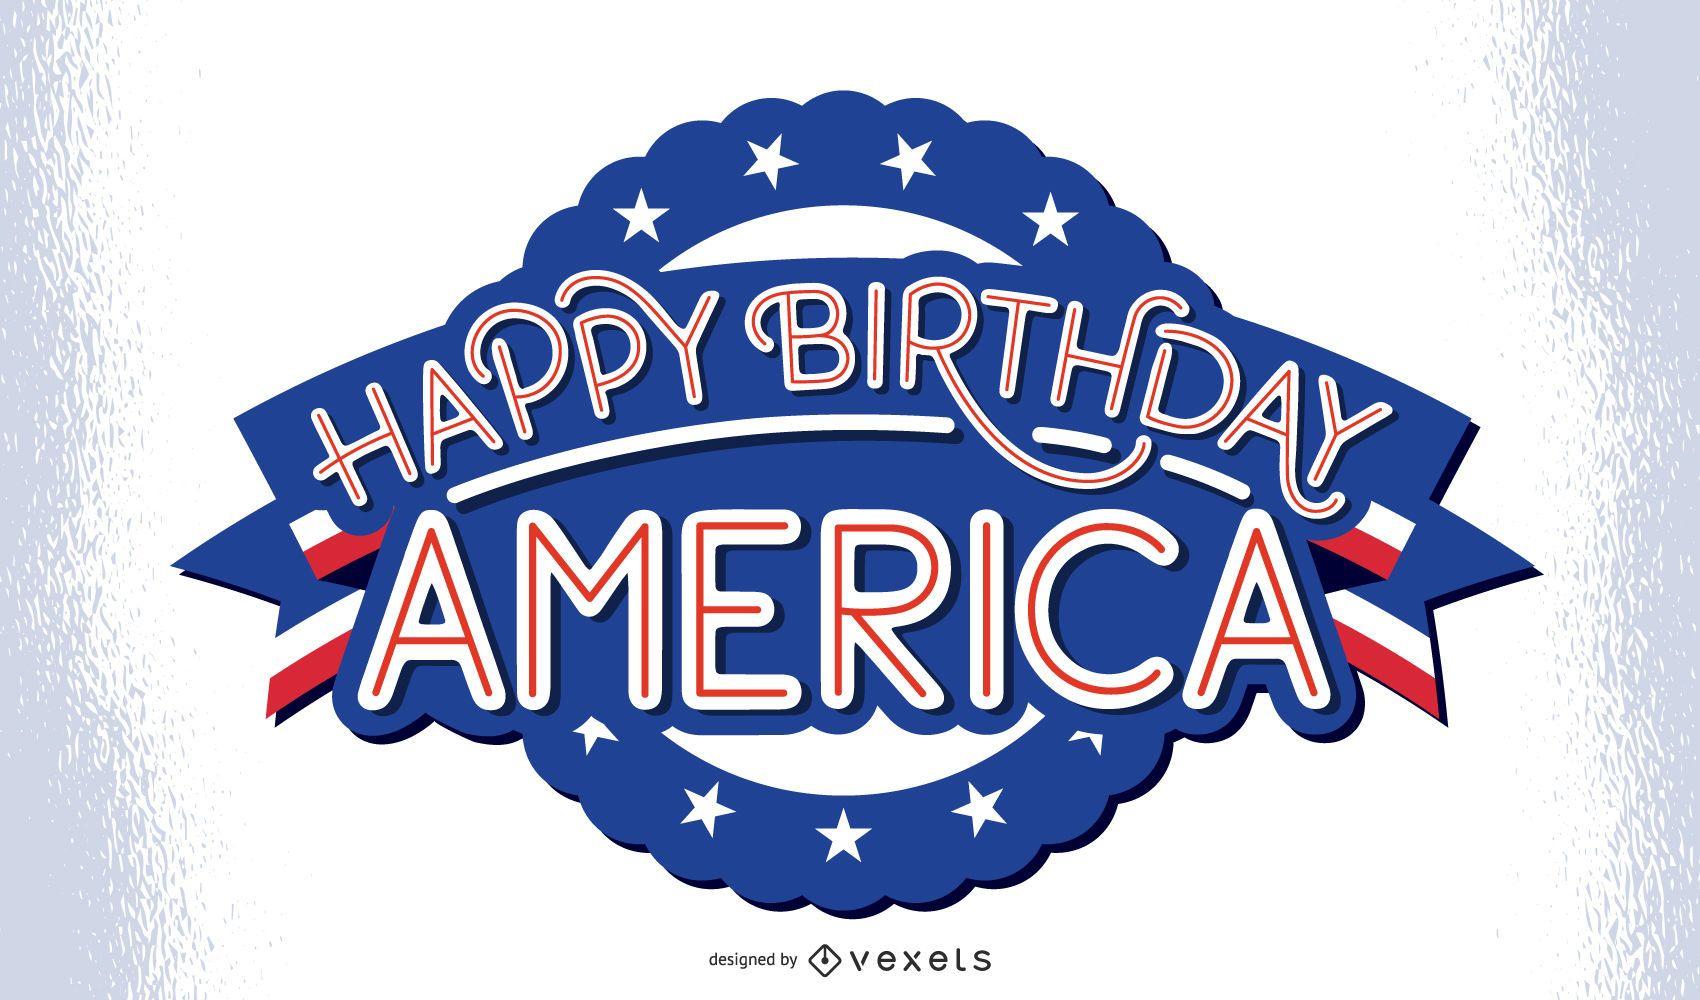 Happy birthday america lettering